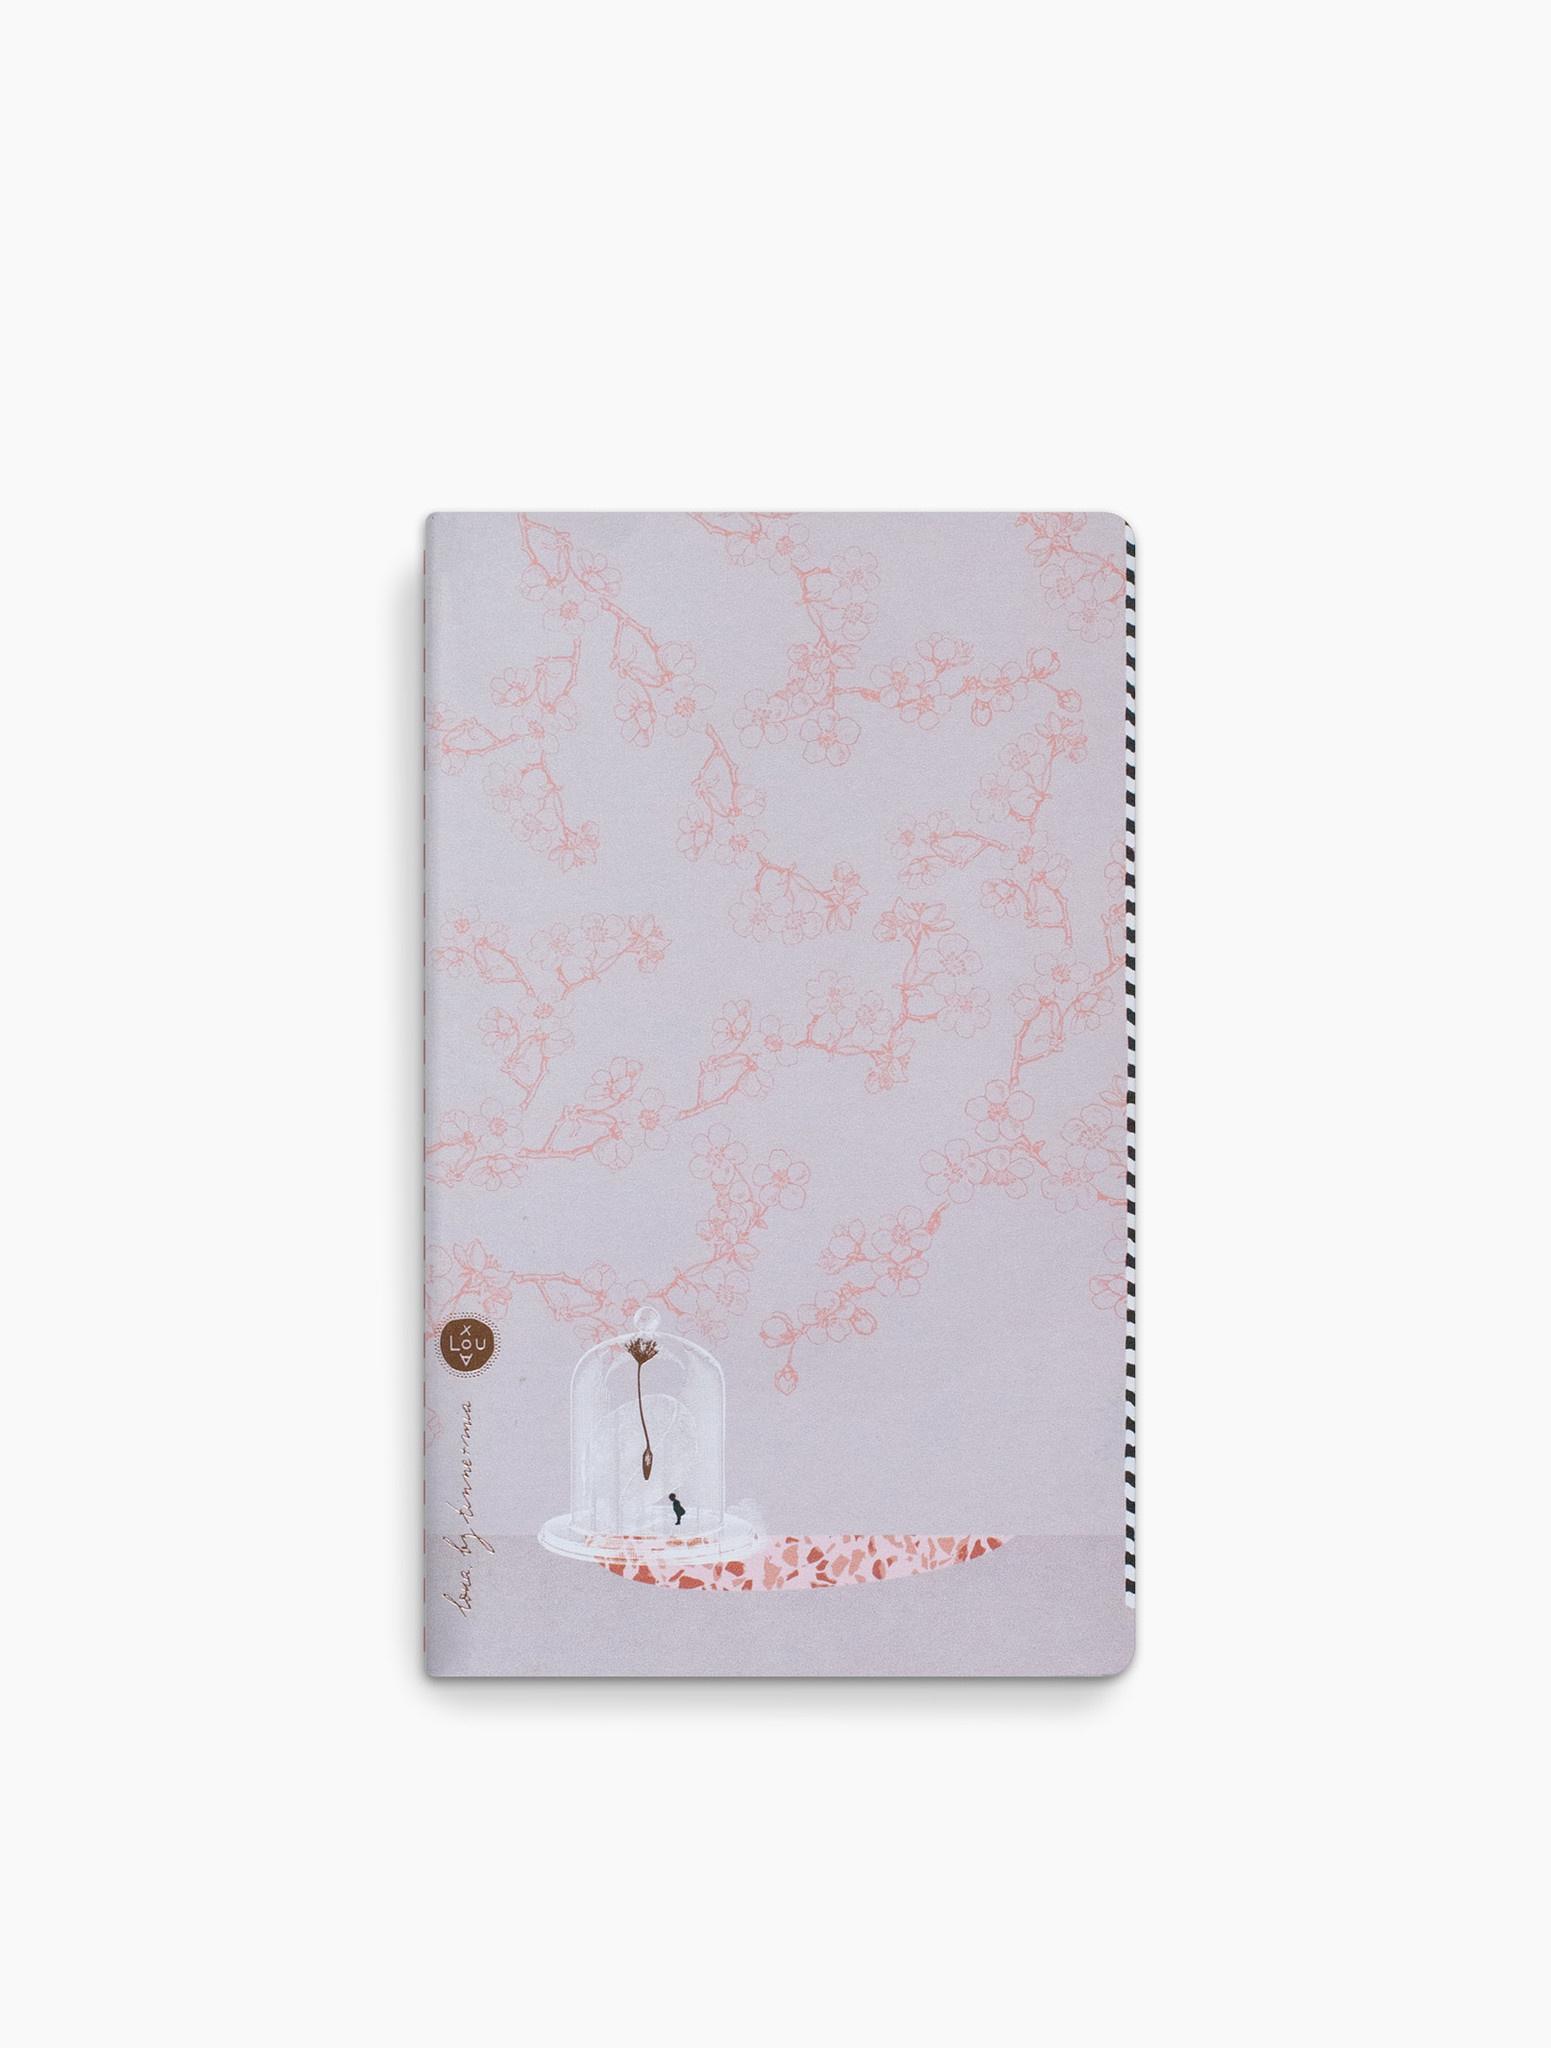 Loua Notebook - Vince Dream (5pcs.)-1